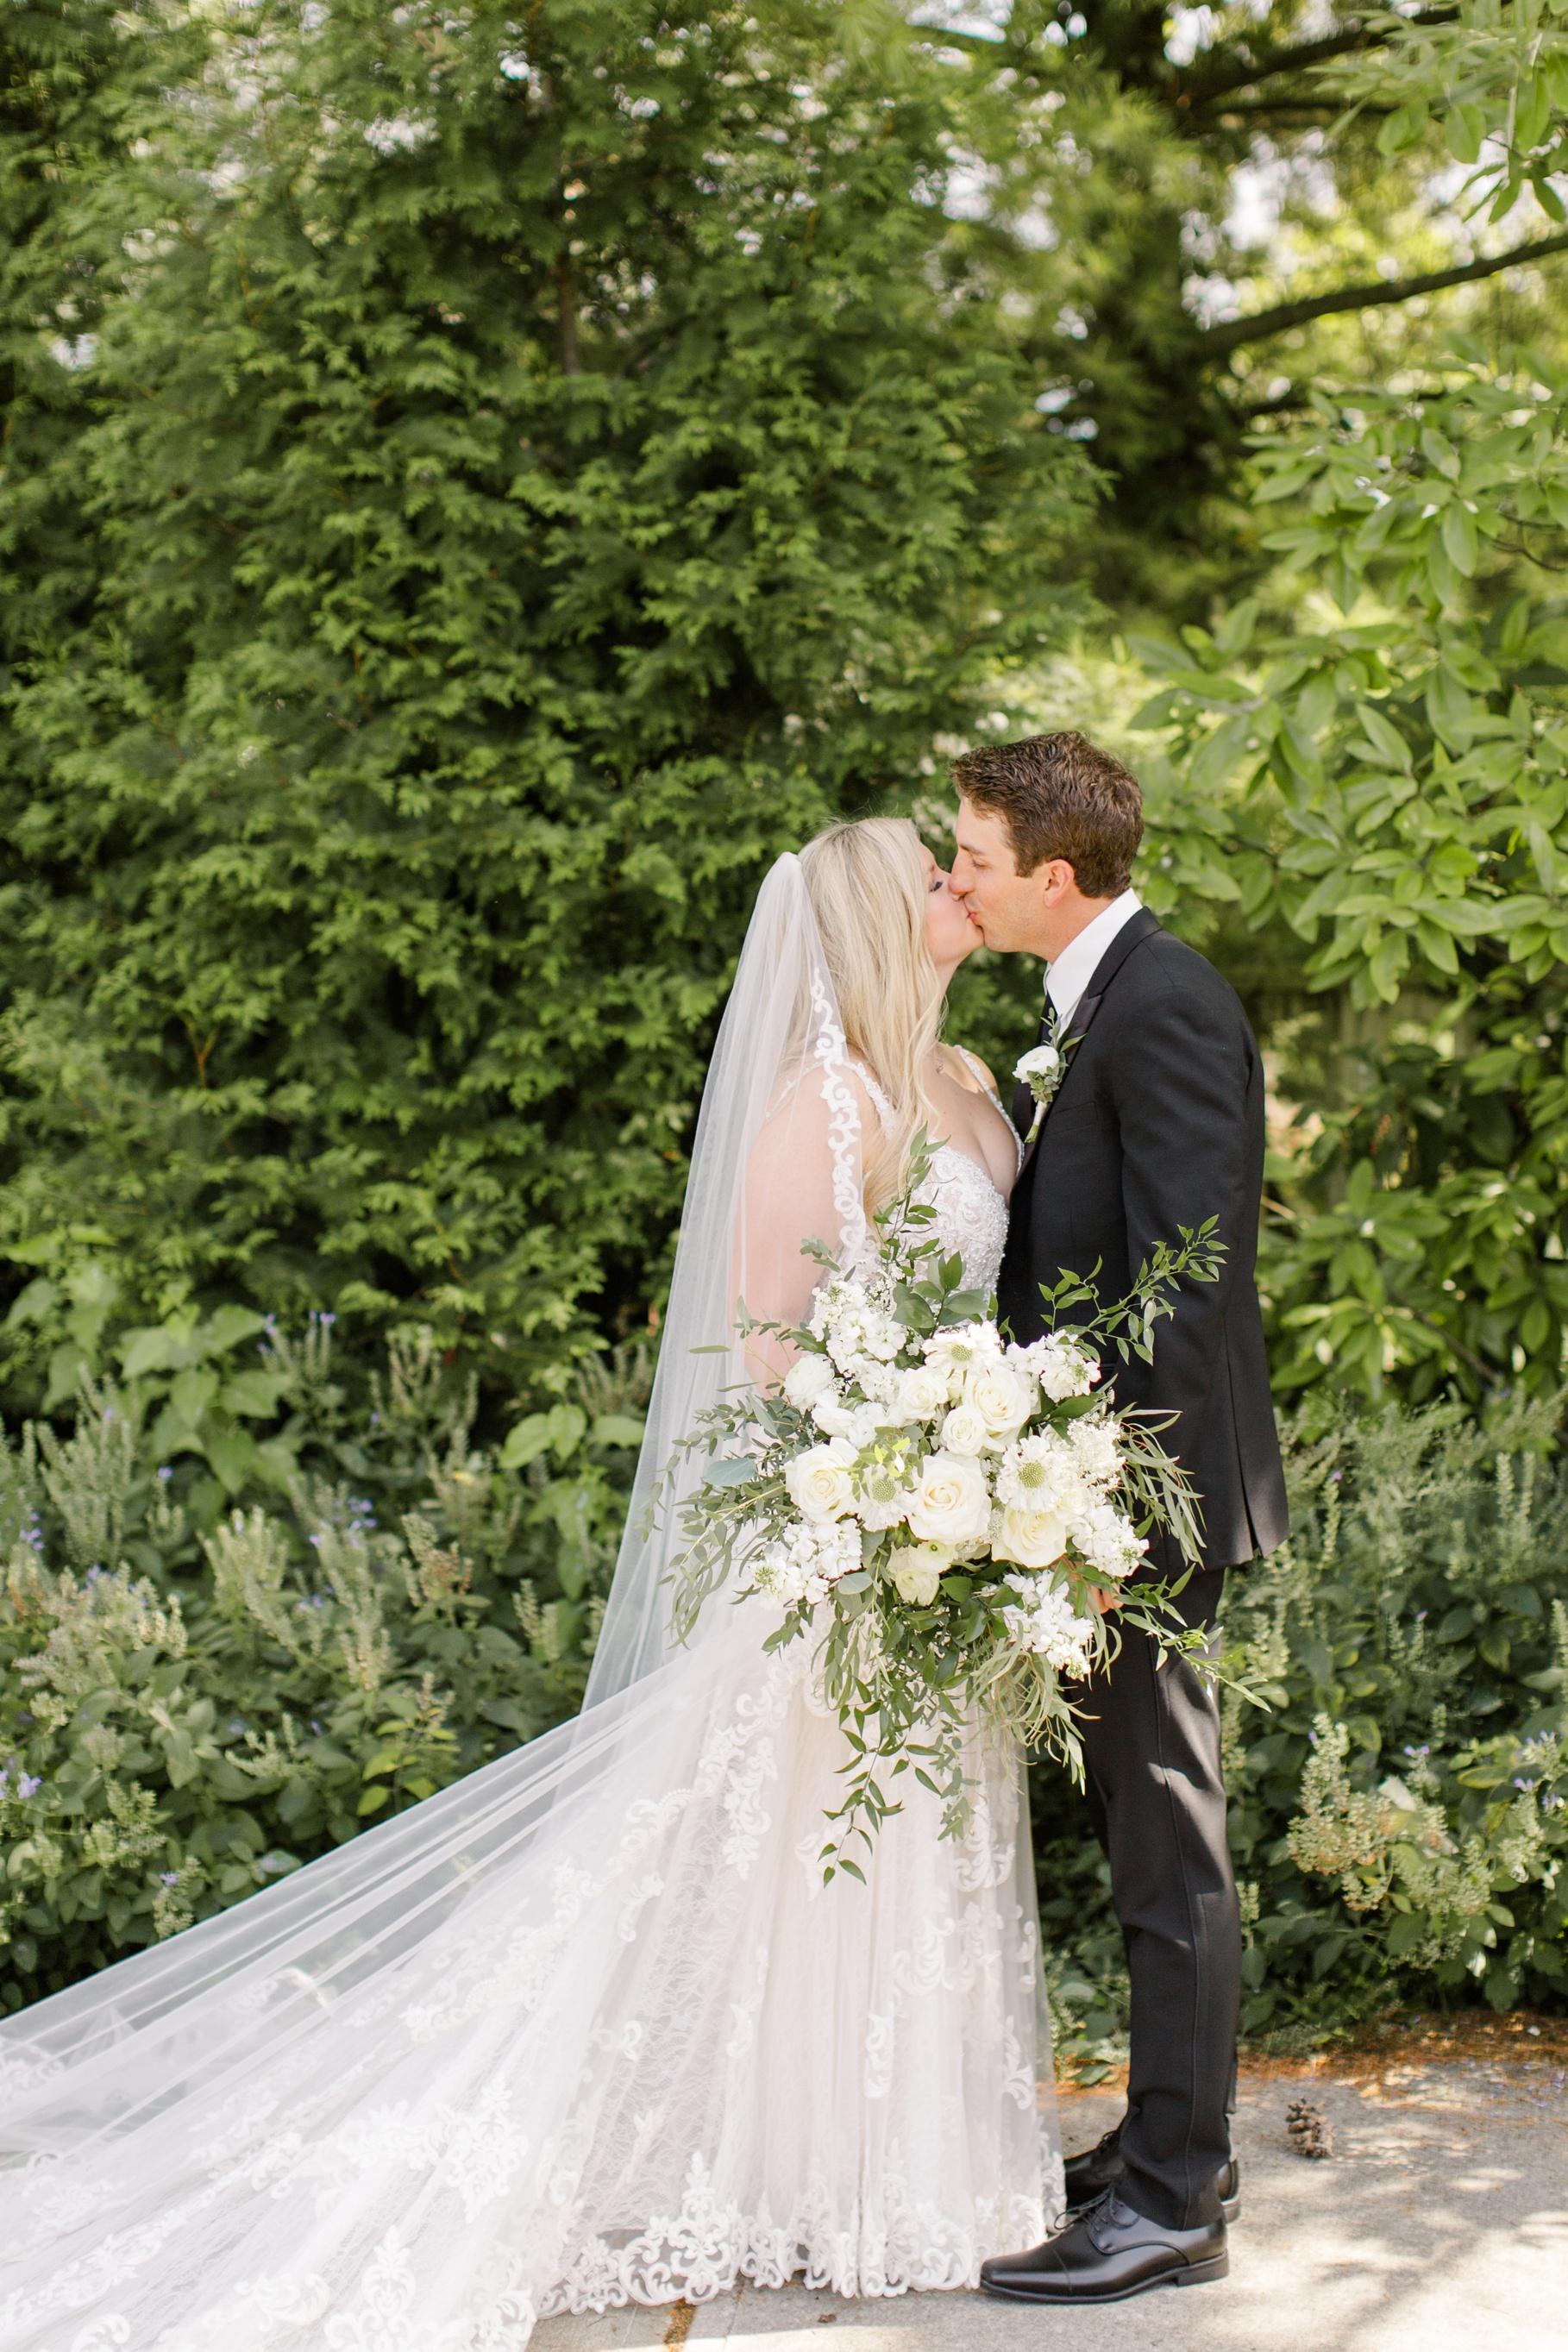 Romantic-wedding-photography-poses